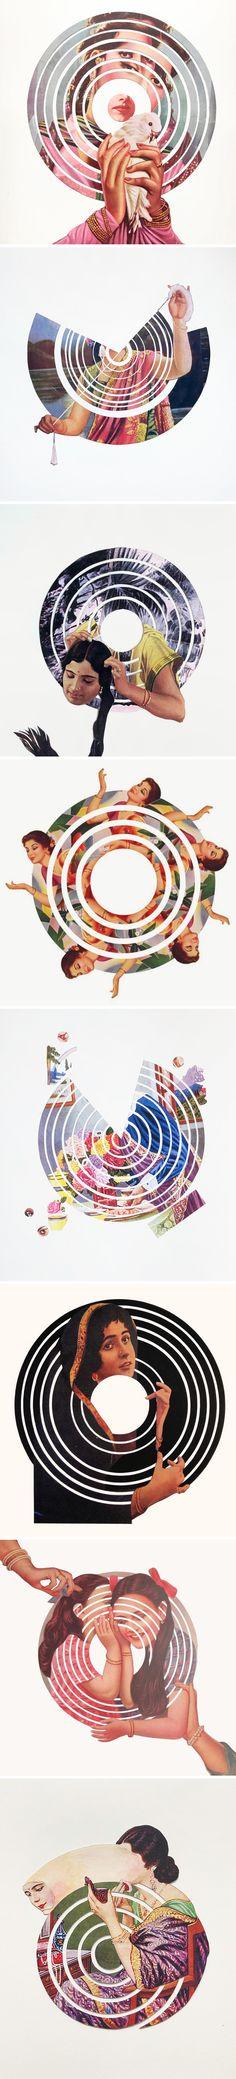 The Jealous Curator /// curated contemporary art /// maya varadaraj Collages, Collage Art, Photomontage, High School Art, Graphic Design Layouts, Modern Artists, Hand Illustration, Minimalist Art, Art Studios